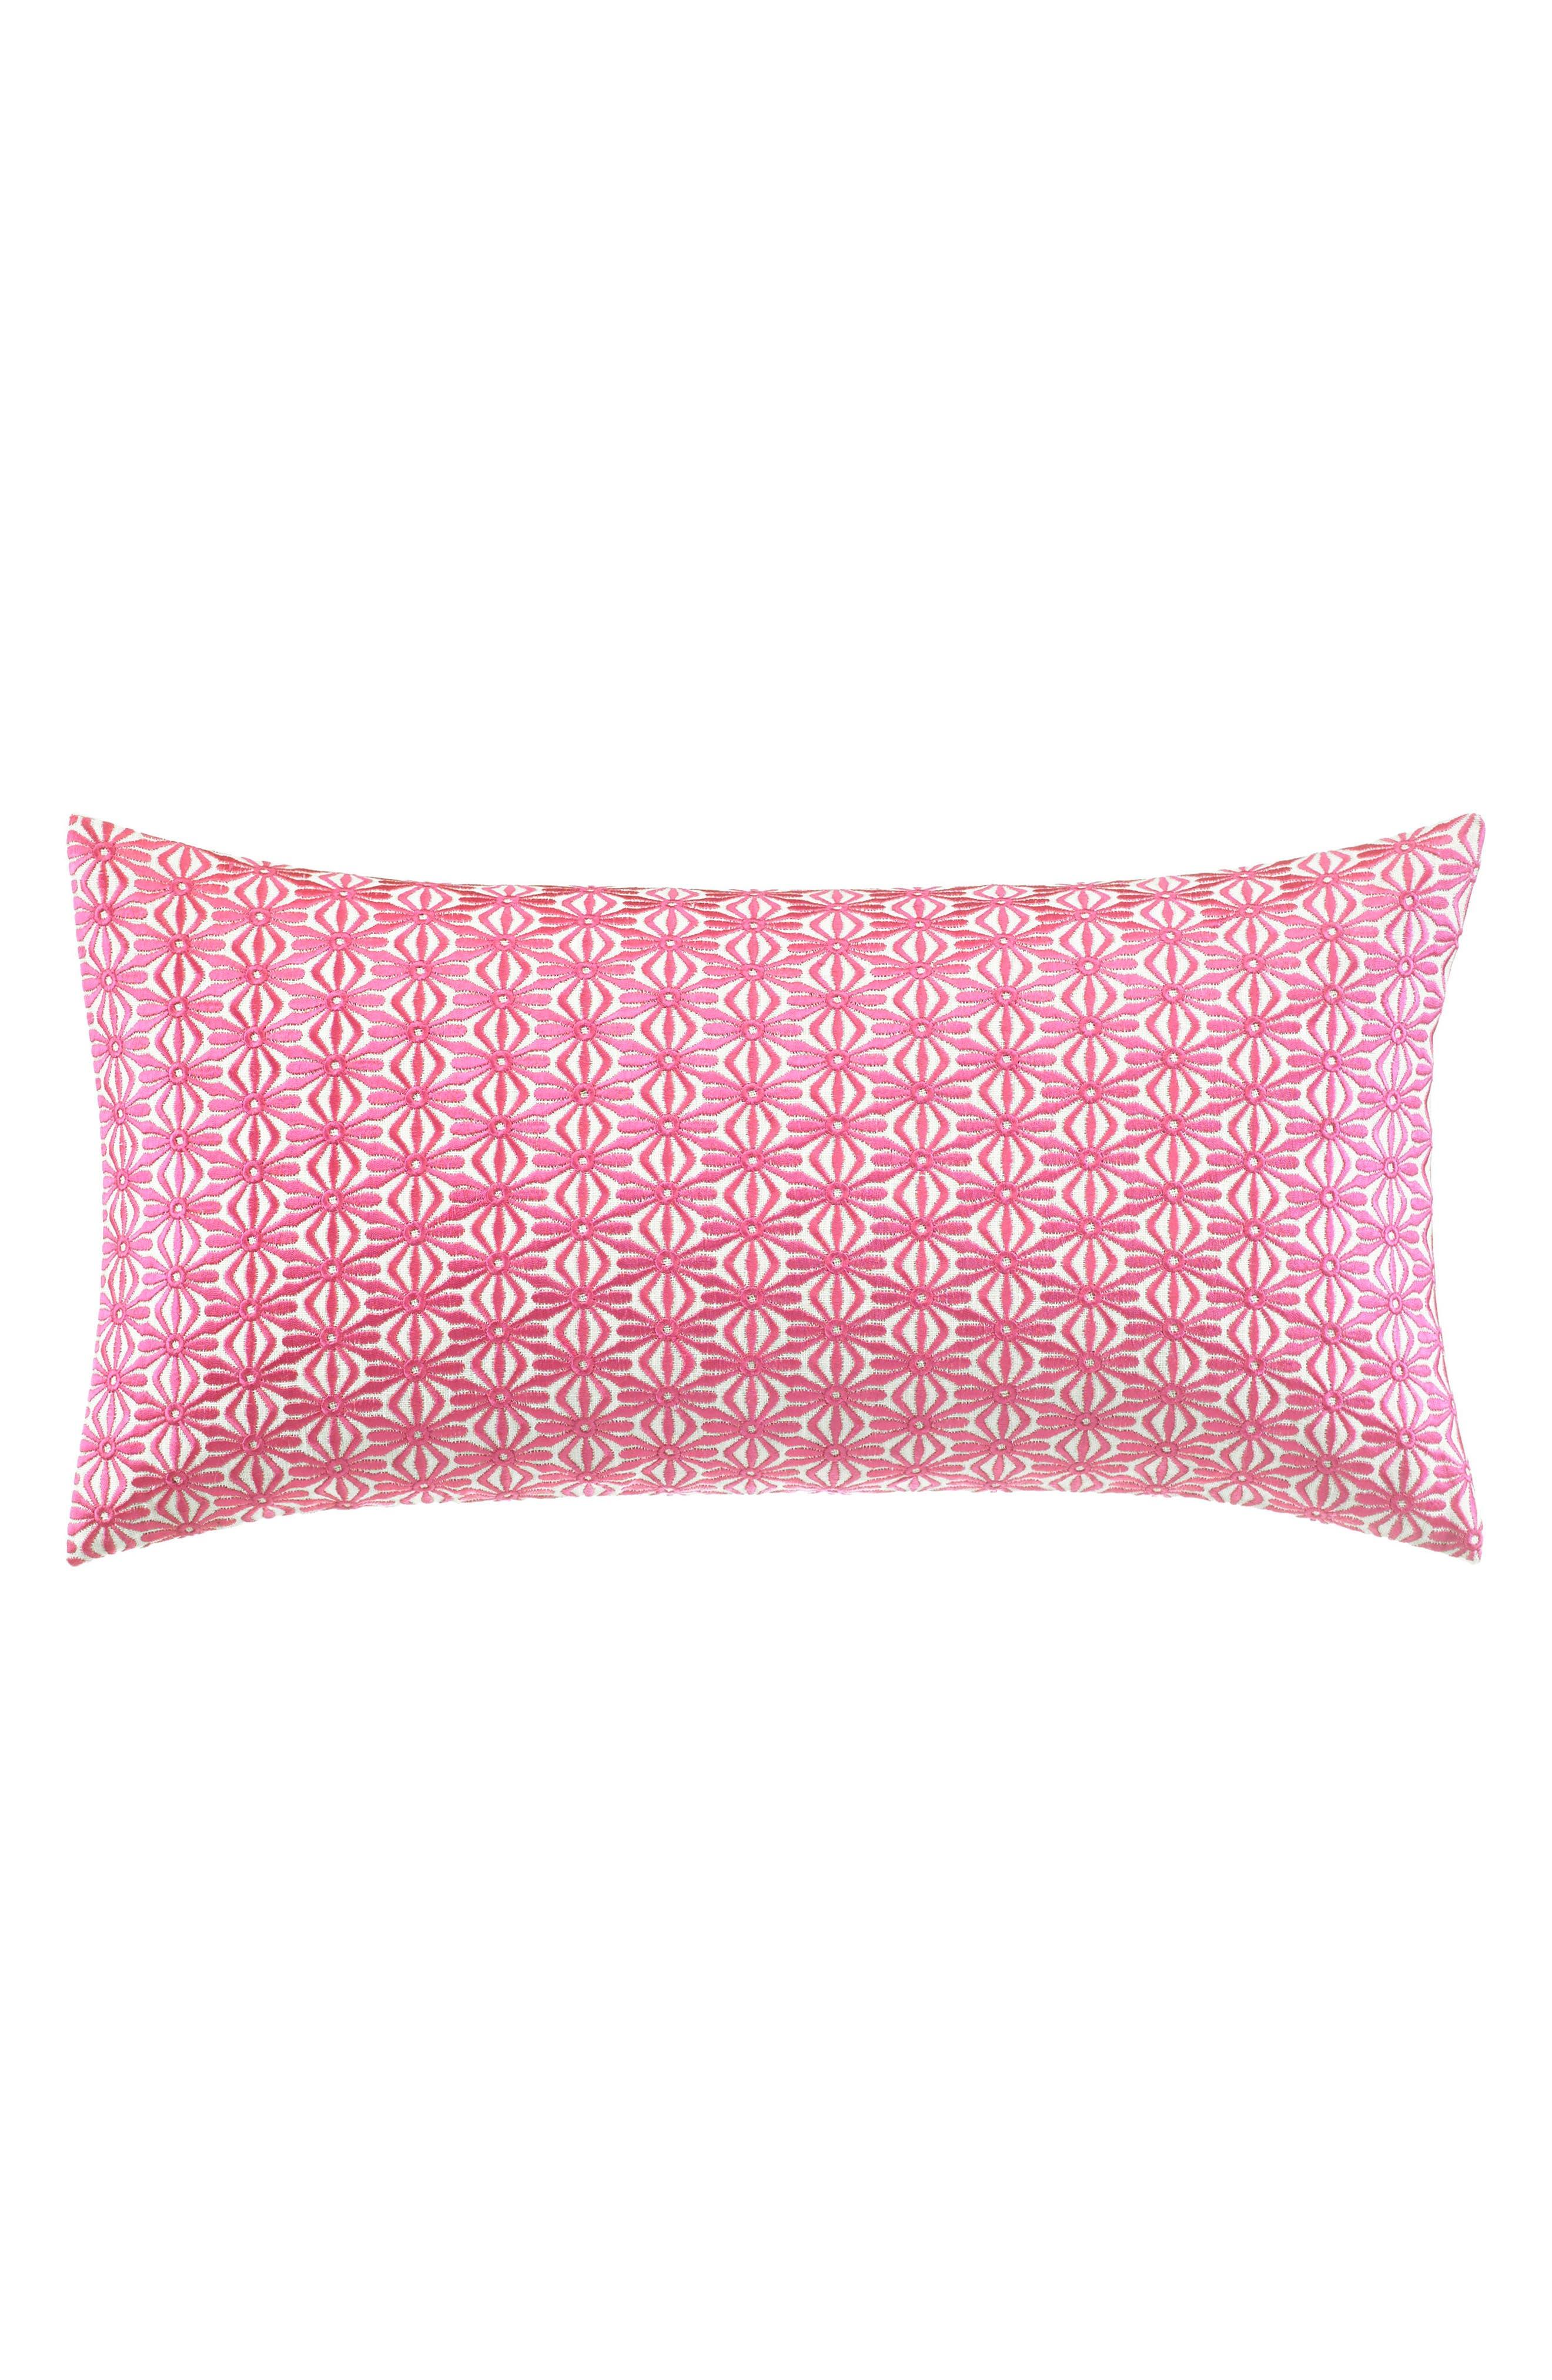 medallion accent pillow,                             Main thumbnail 1, color,                             650